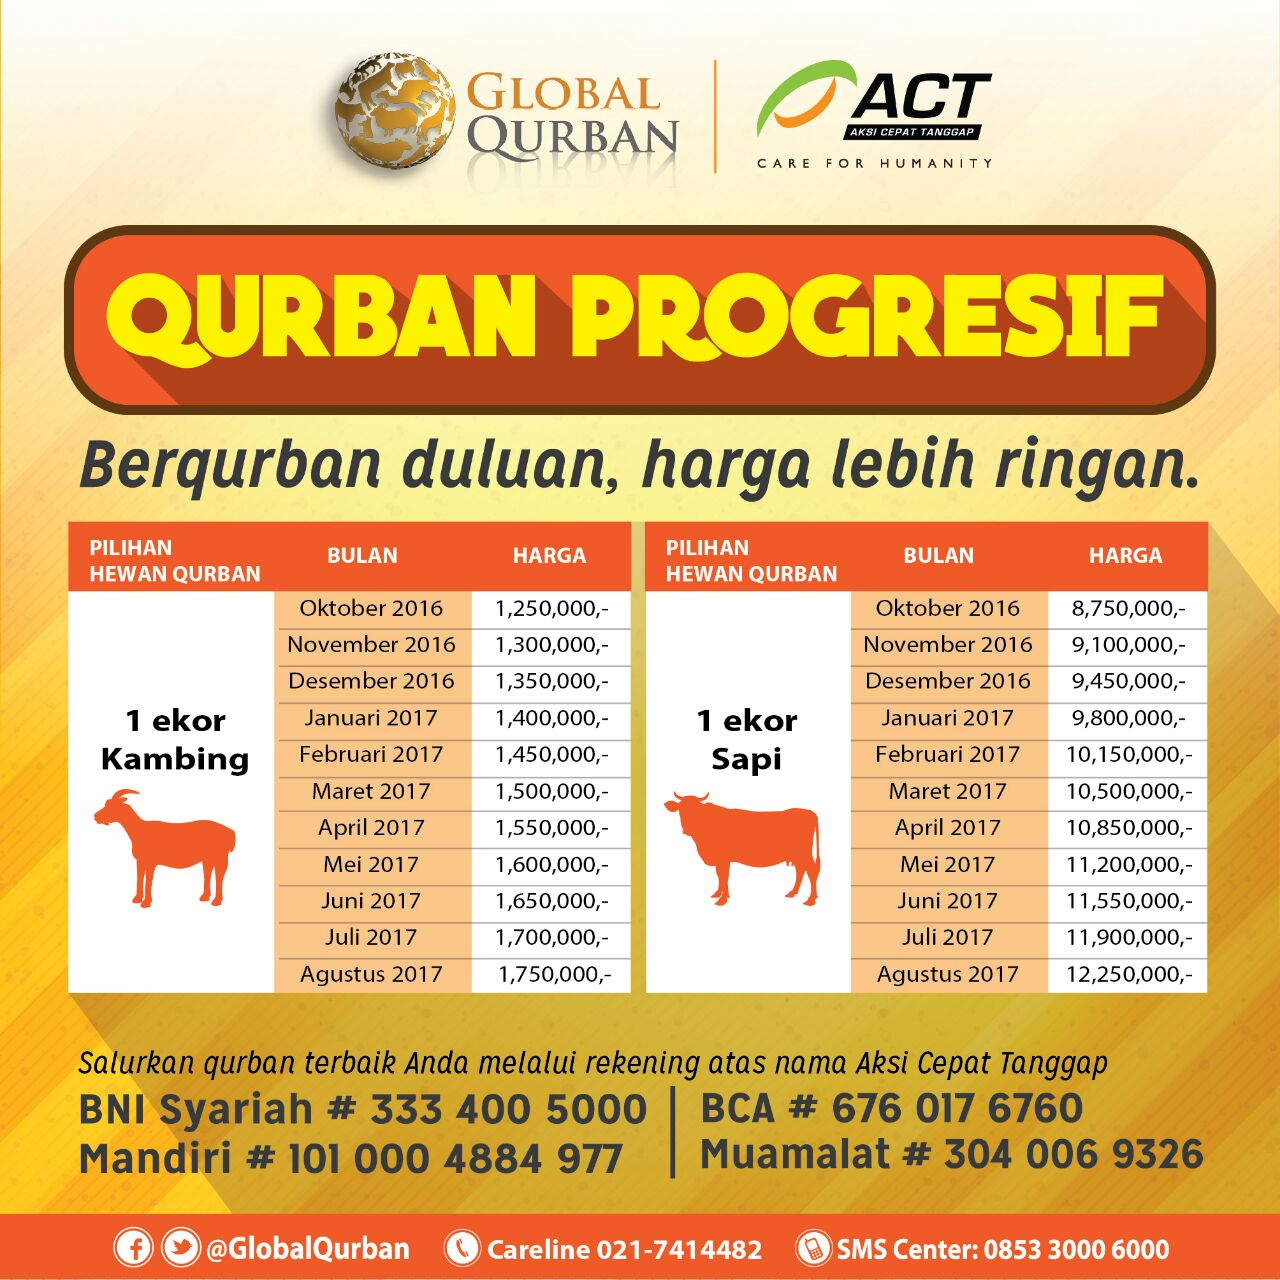 Qurban Progresif Berkurban Duluan Harga Lebih Ringan